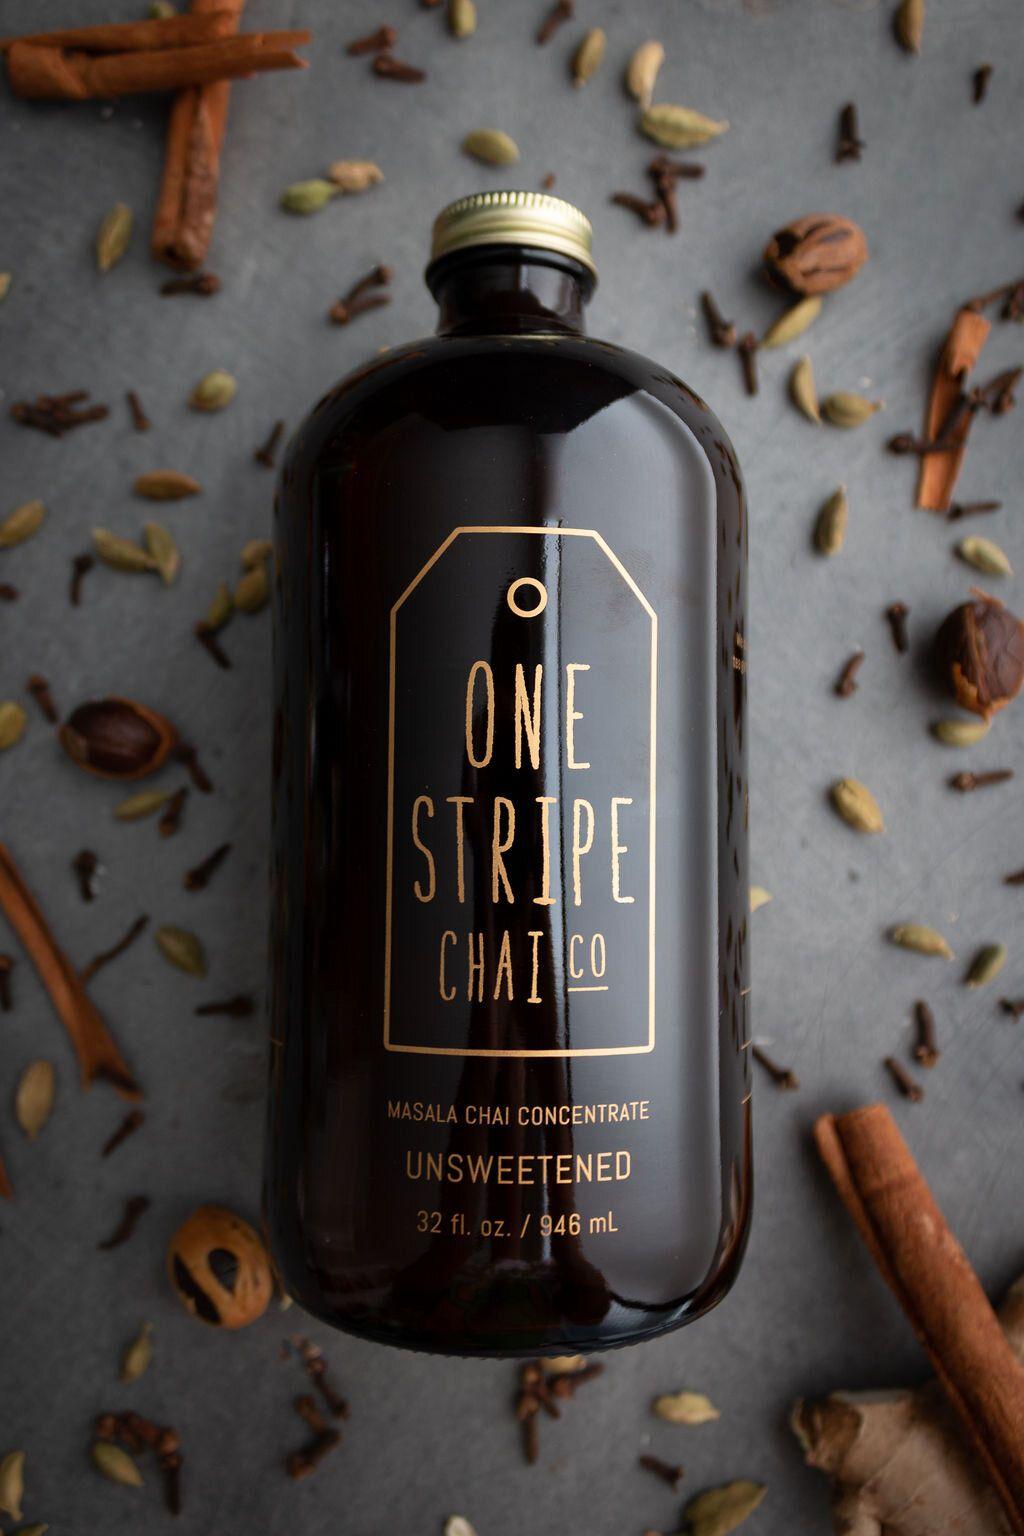 one-stripe-chai-co-unsweetened-chai-concentrate